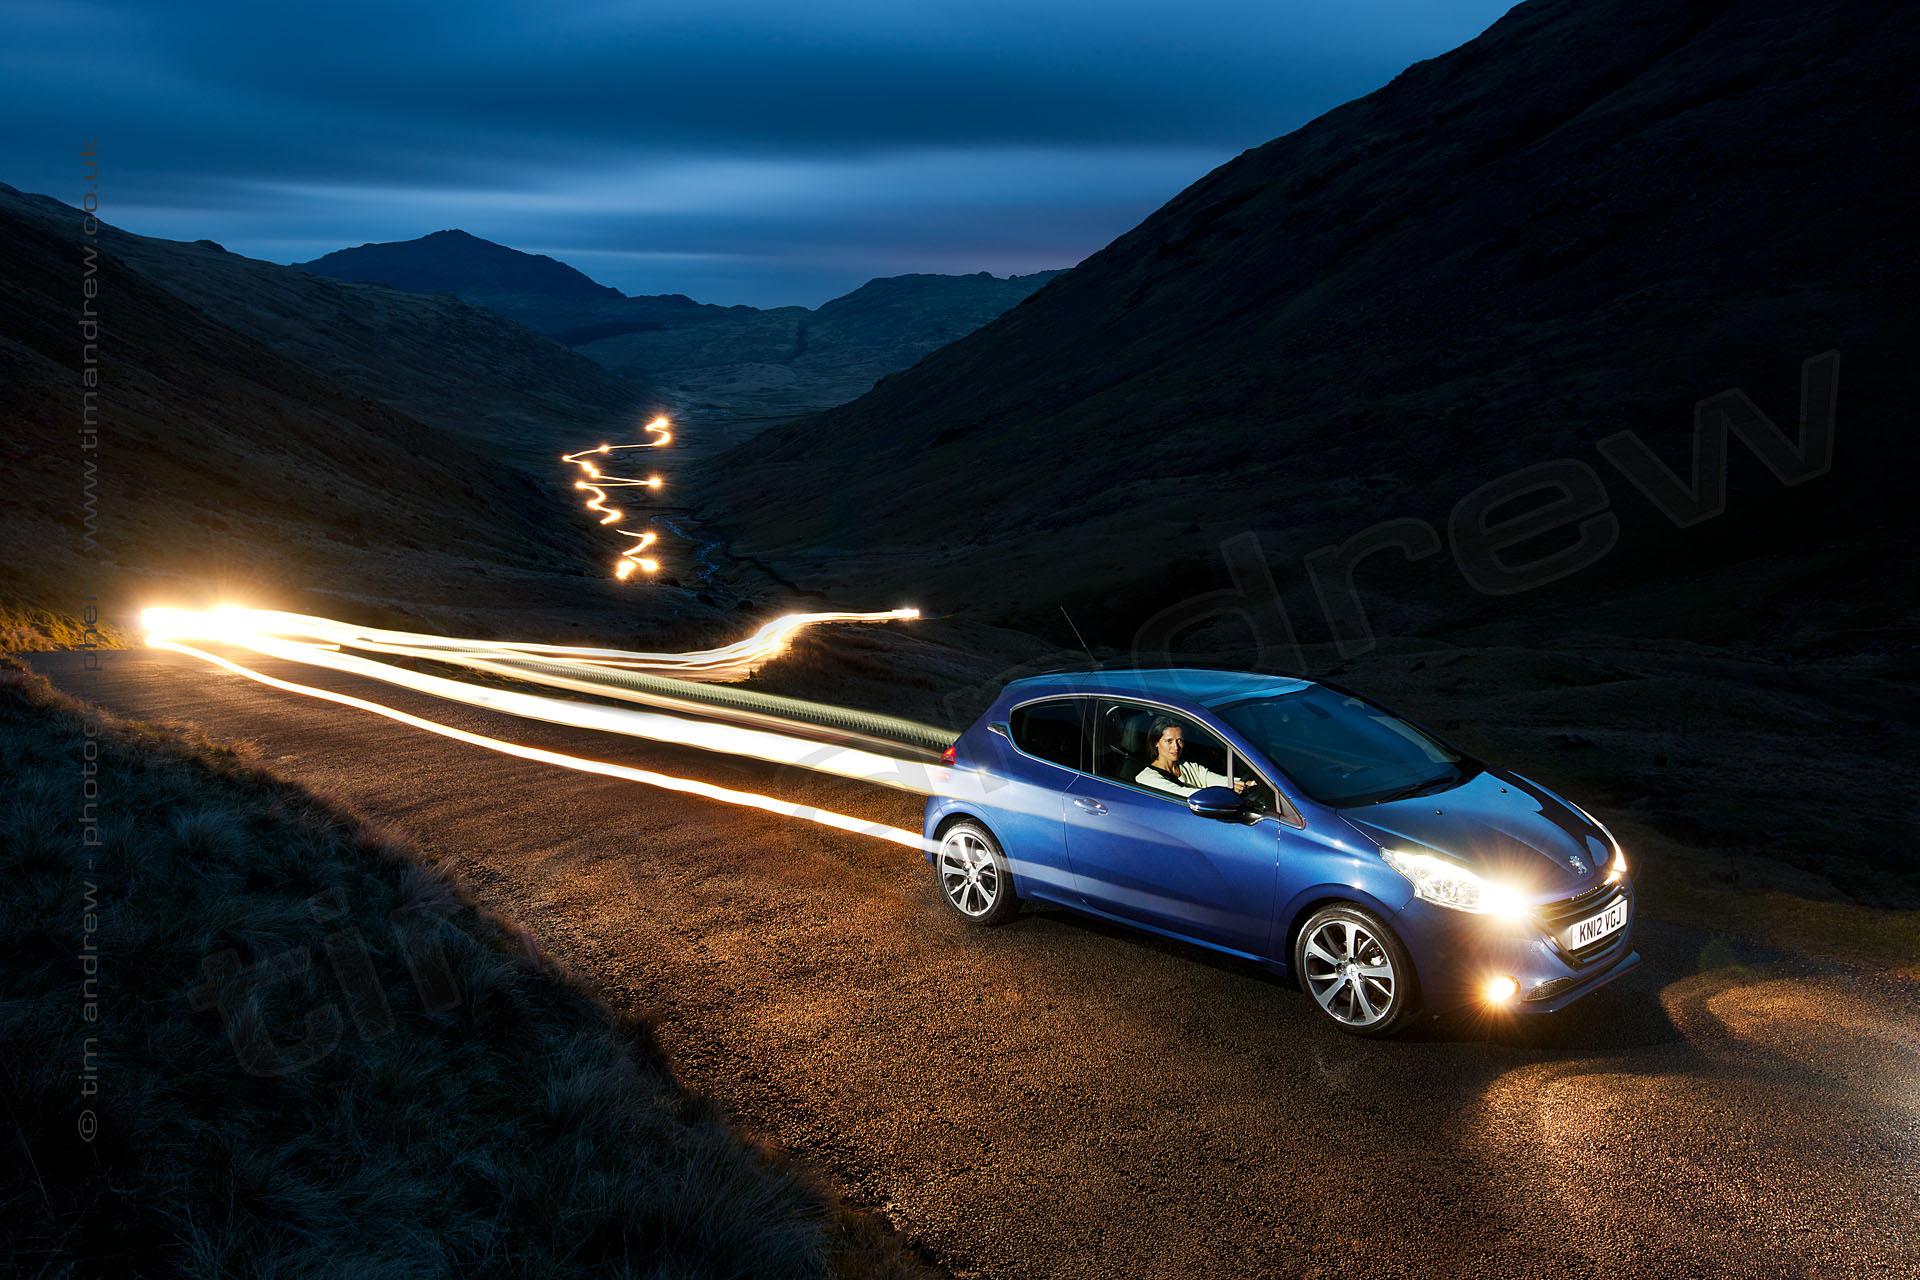 Peugeot 208 GTi steak lights at night